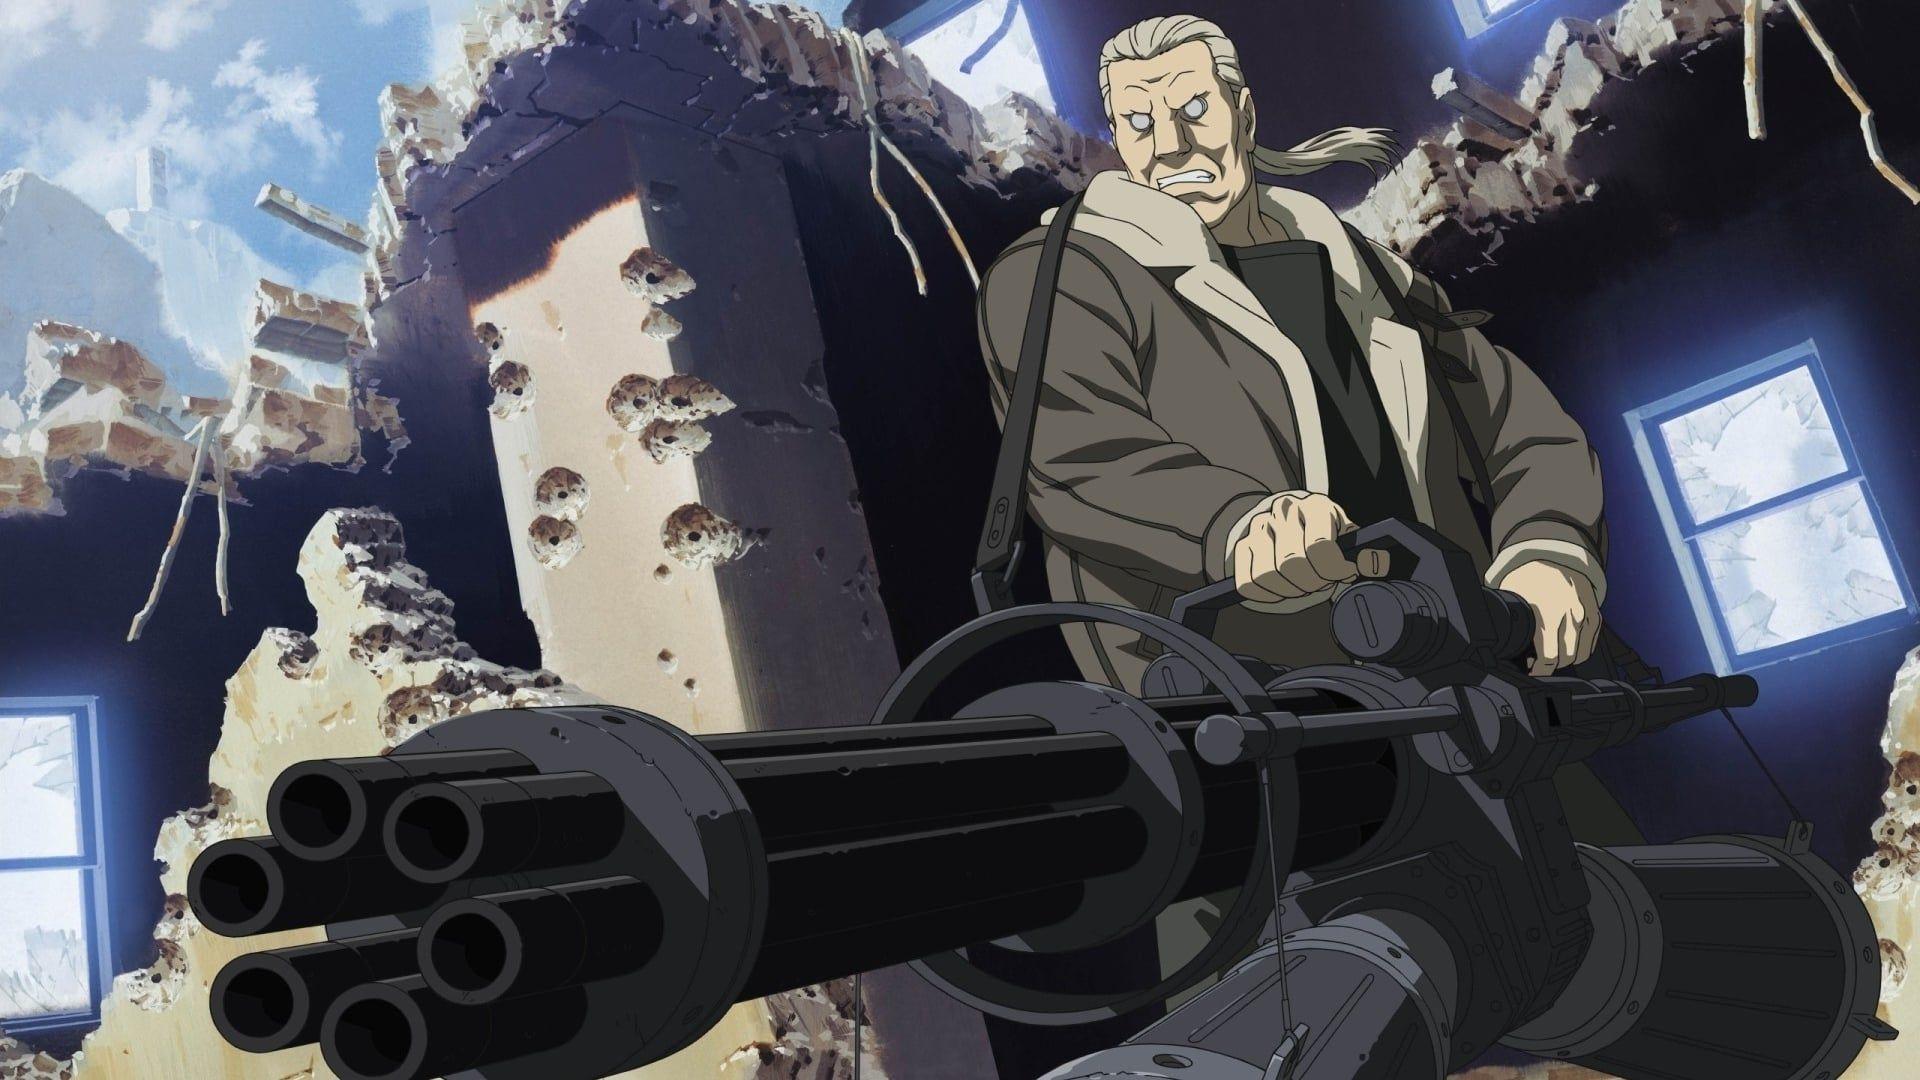 Ghost In The Shell 1995 Putlocker Film Complet Streaming Alles Speelt Zich Af In 2029 Het Ministerie Van Buitenlandse Zak Ghost In The Shell Anime Anime Ghost